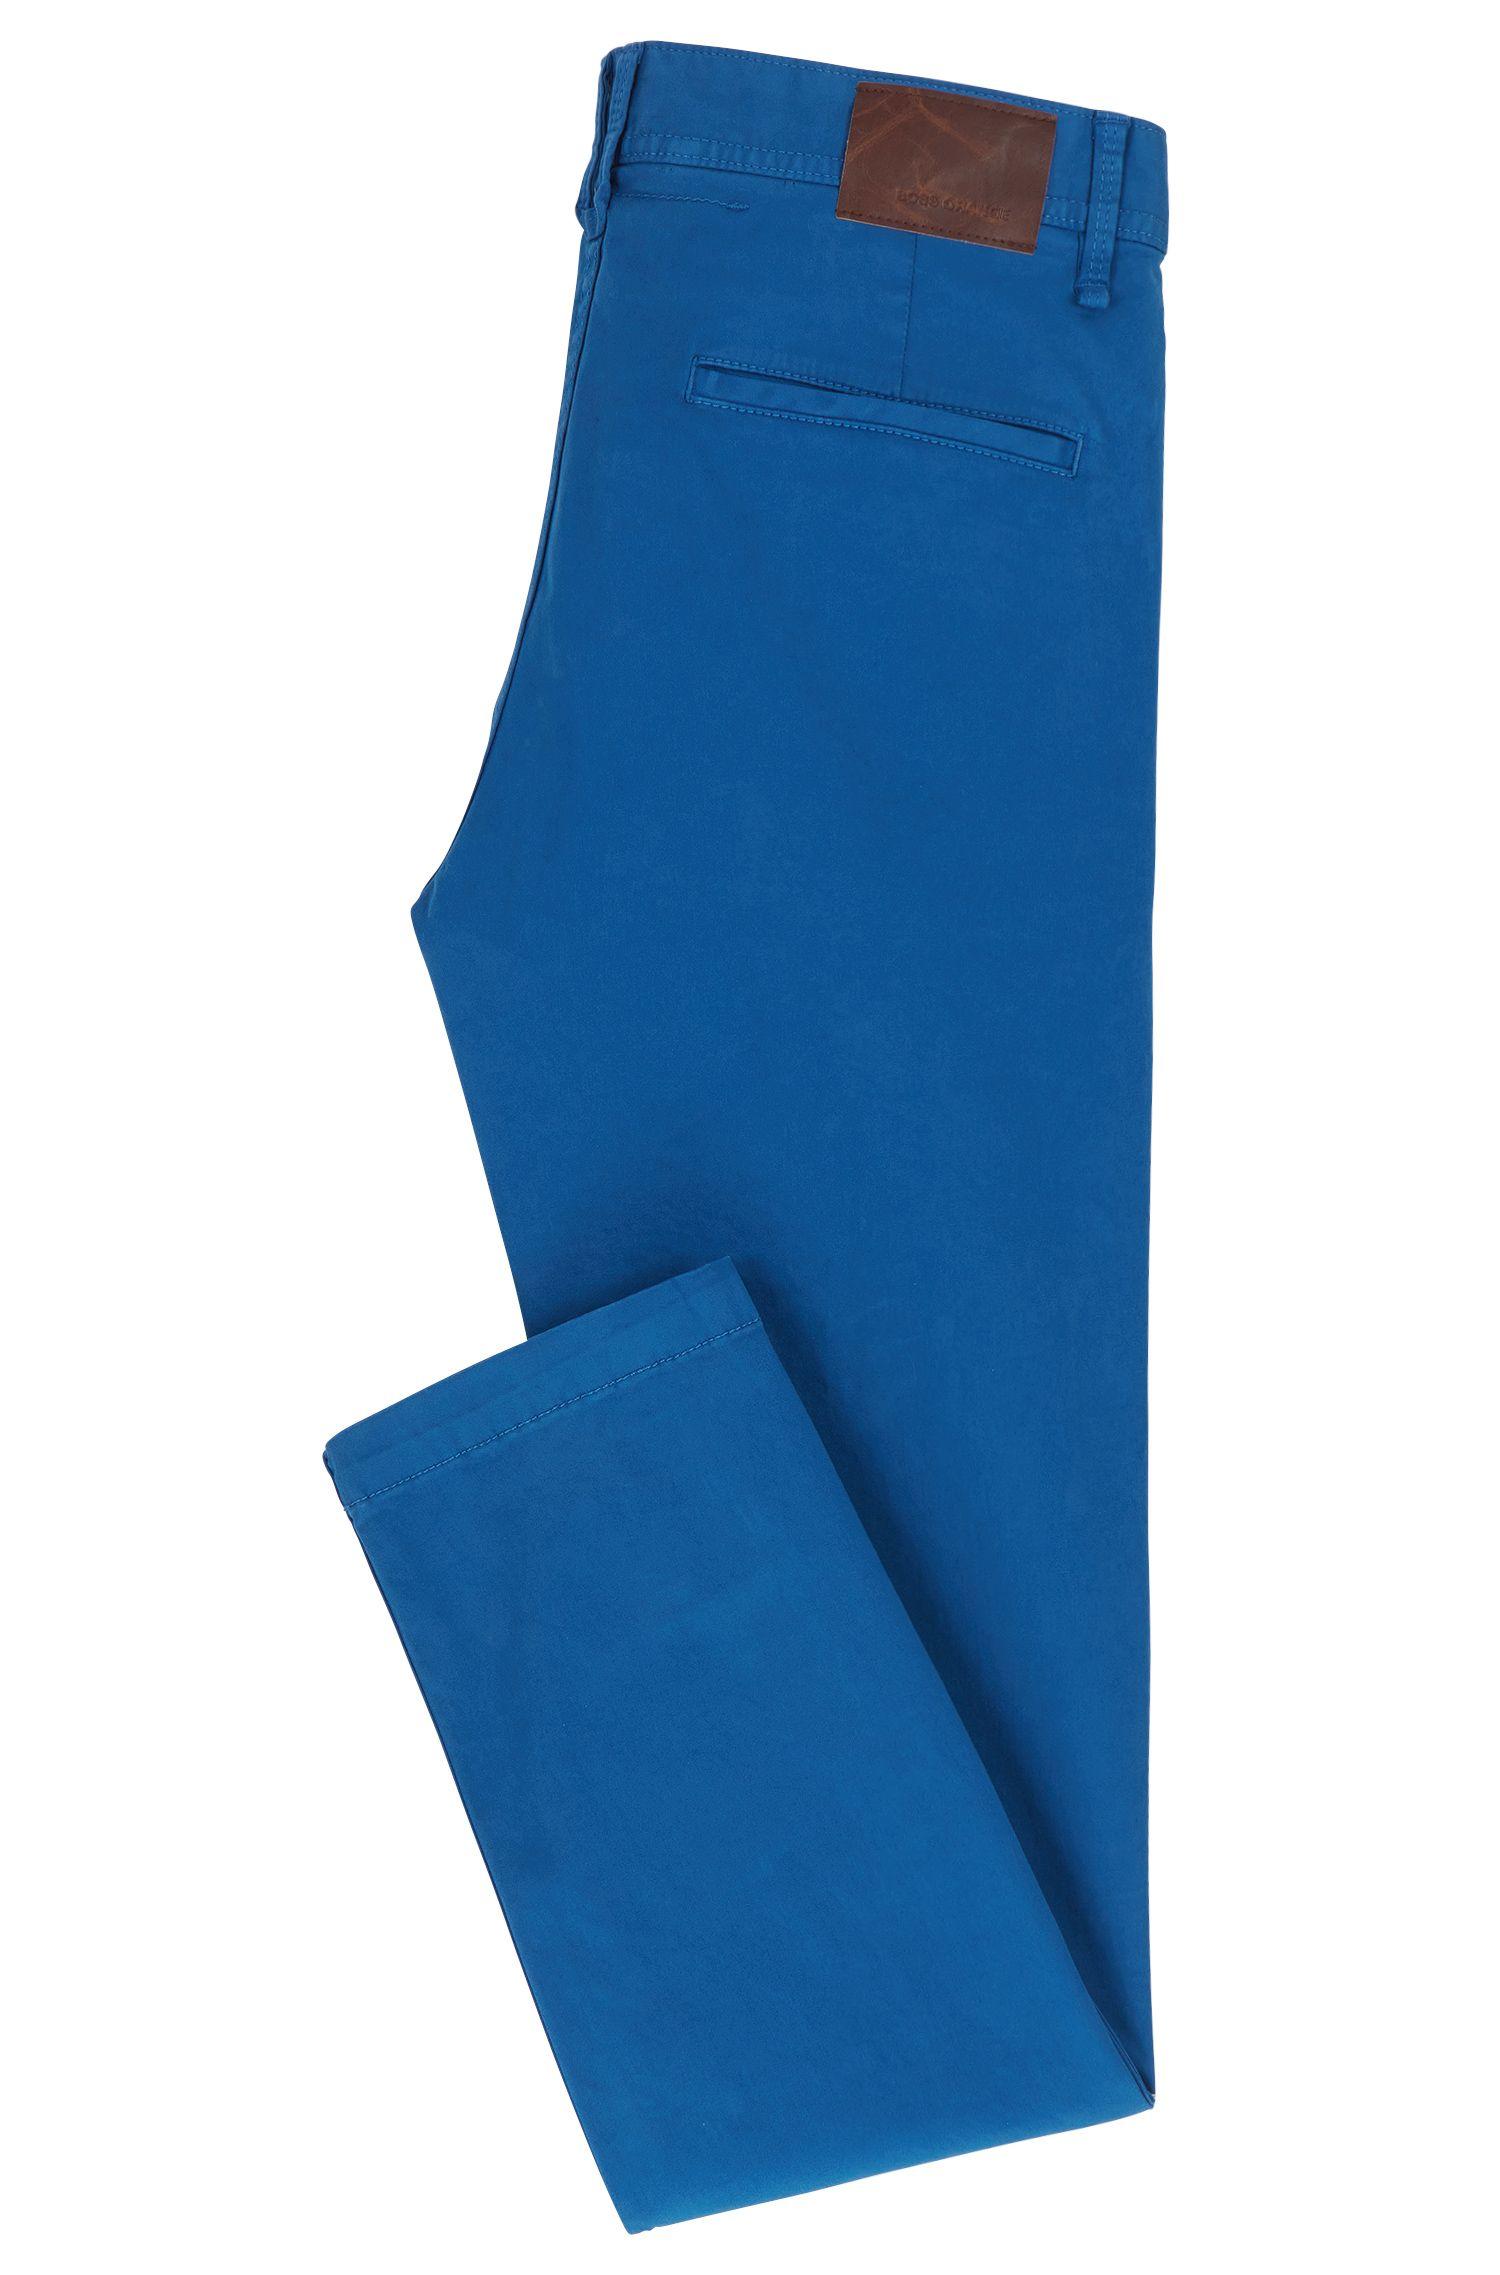 Stretch Cotton Chino Pants, Slim Fit | Schino Slim D, Blue